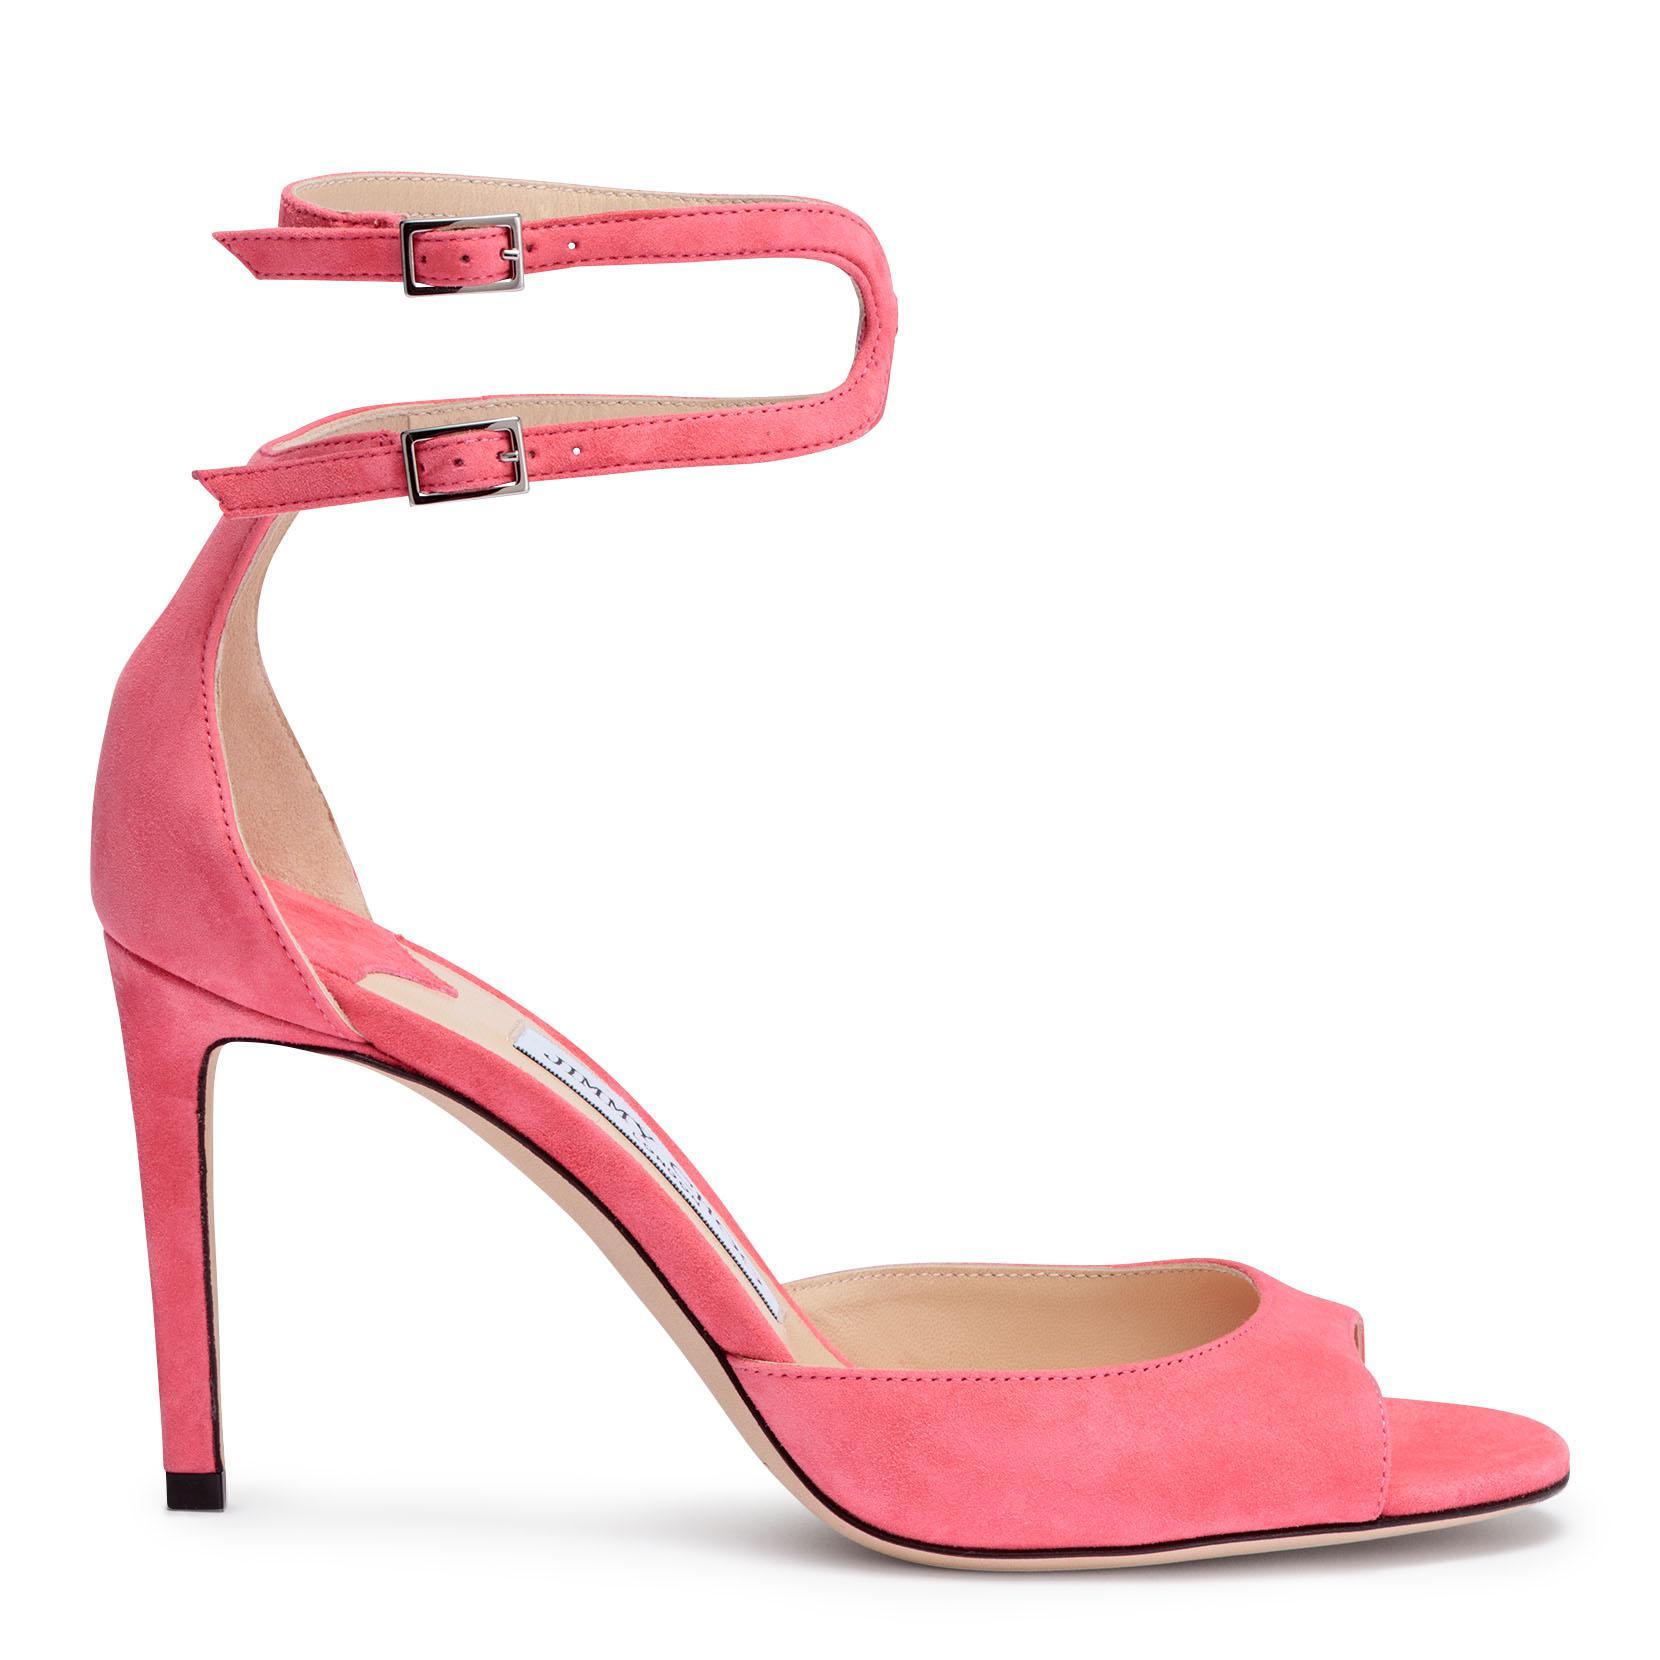 Lane 85 pink suede sandals Jimmy Choo London A6jJiomv